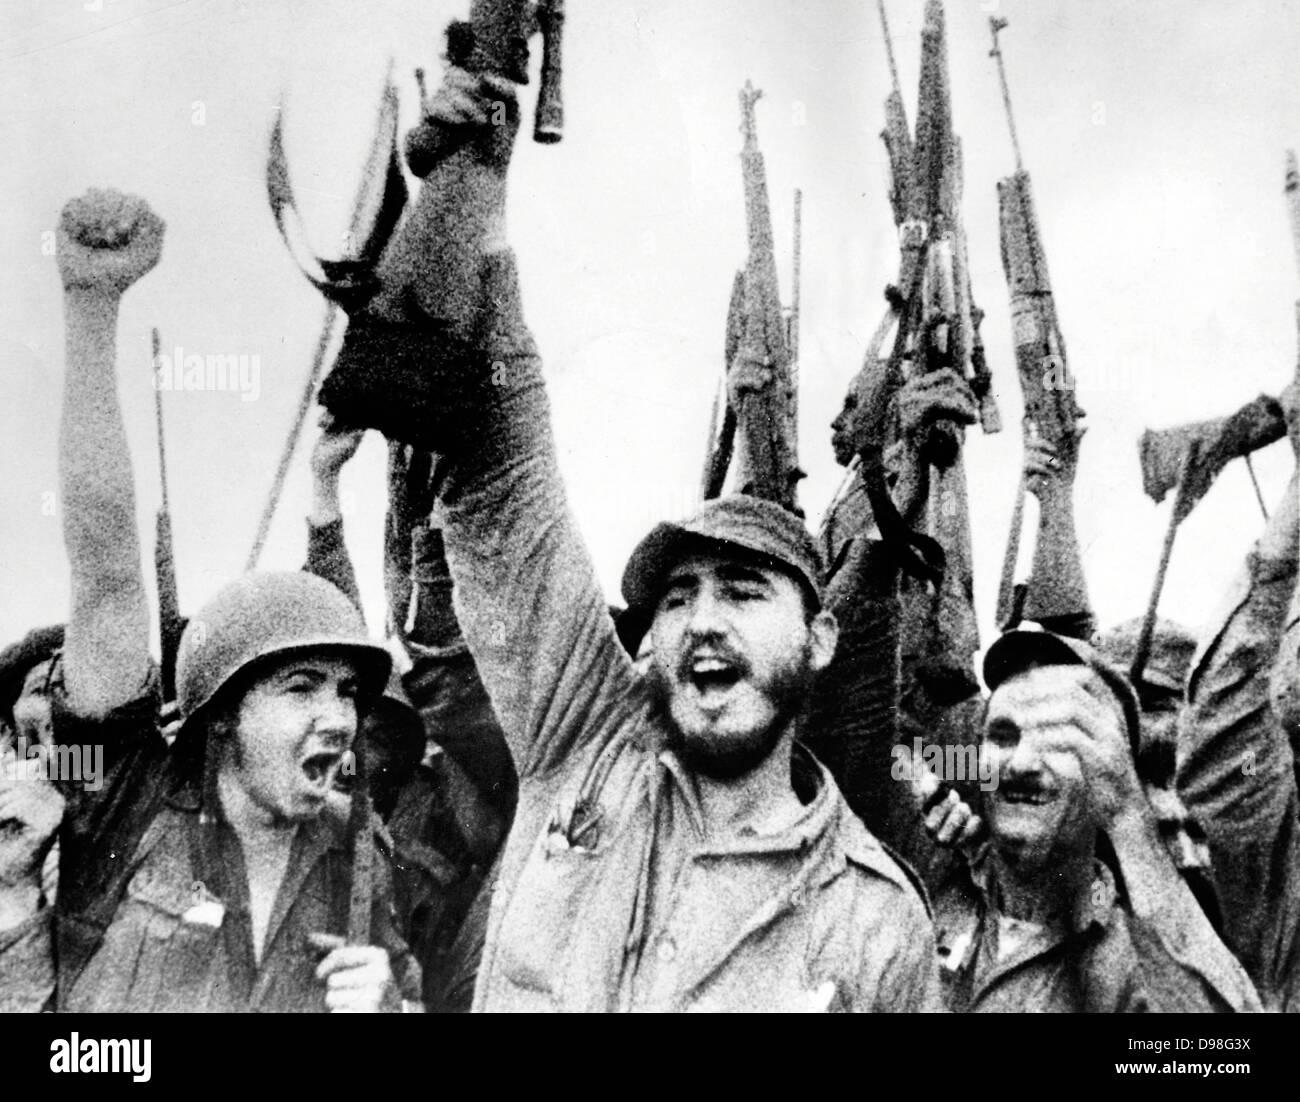 Fidel Alejandro Castro Ruz (born August 13, 1926) is a communist Cuba n politician - Stock Image